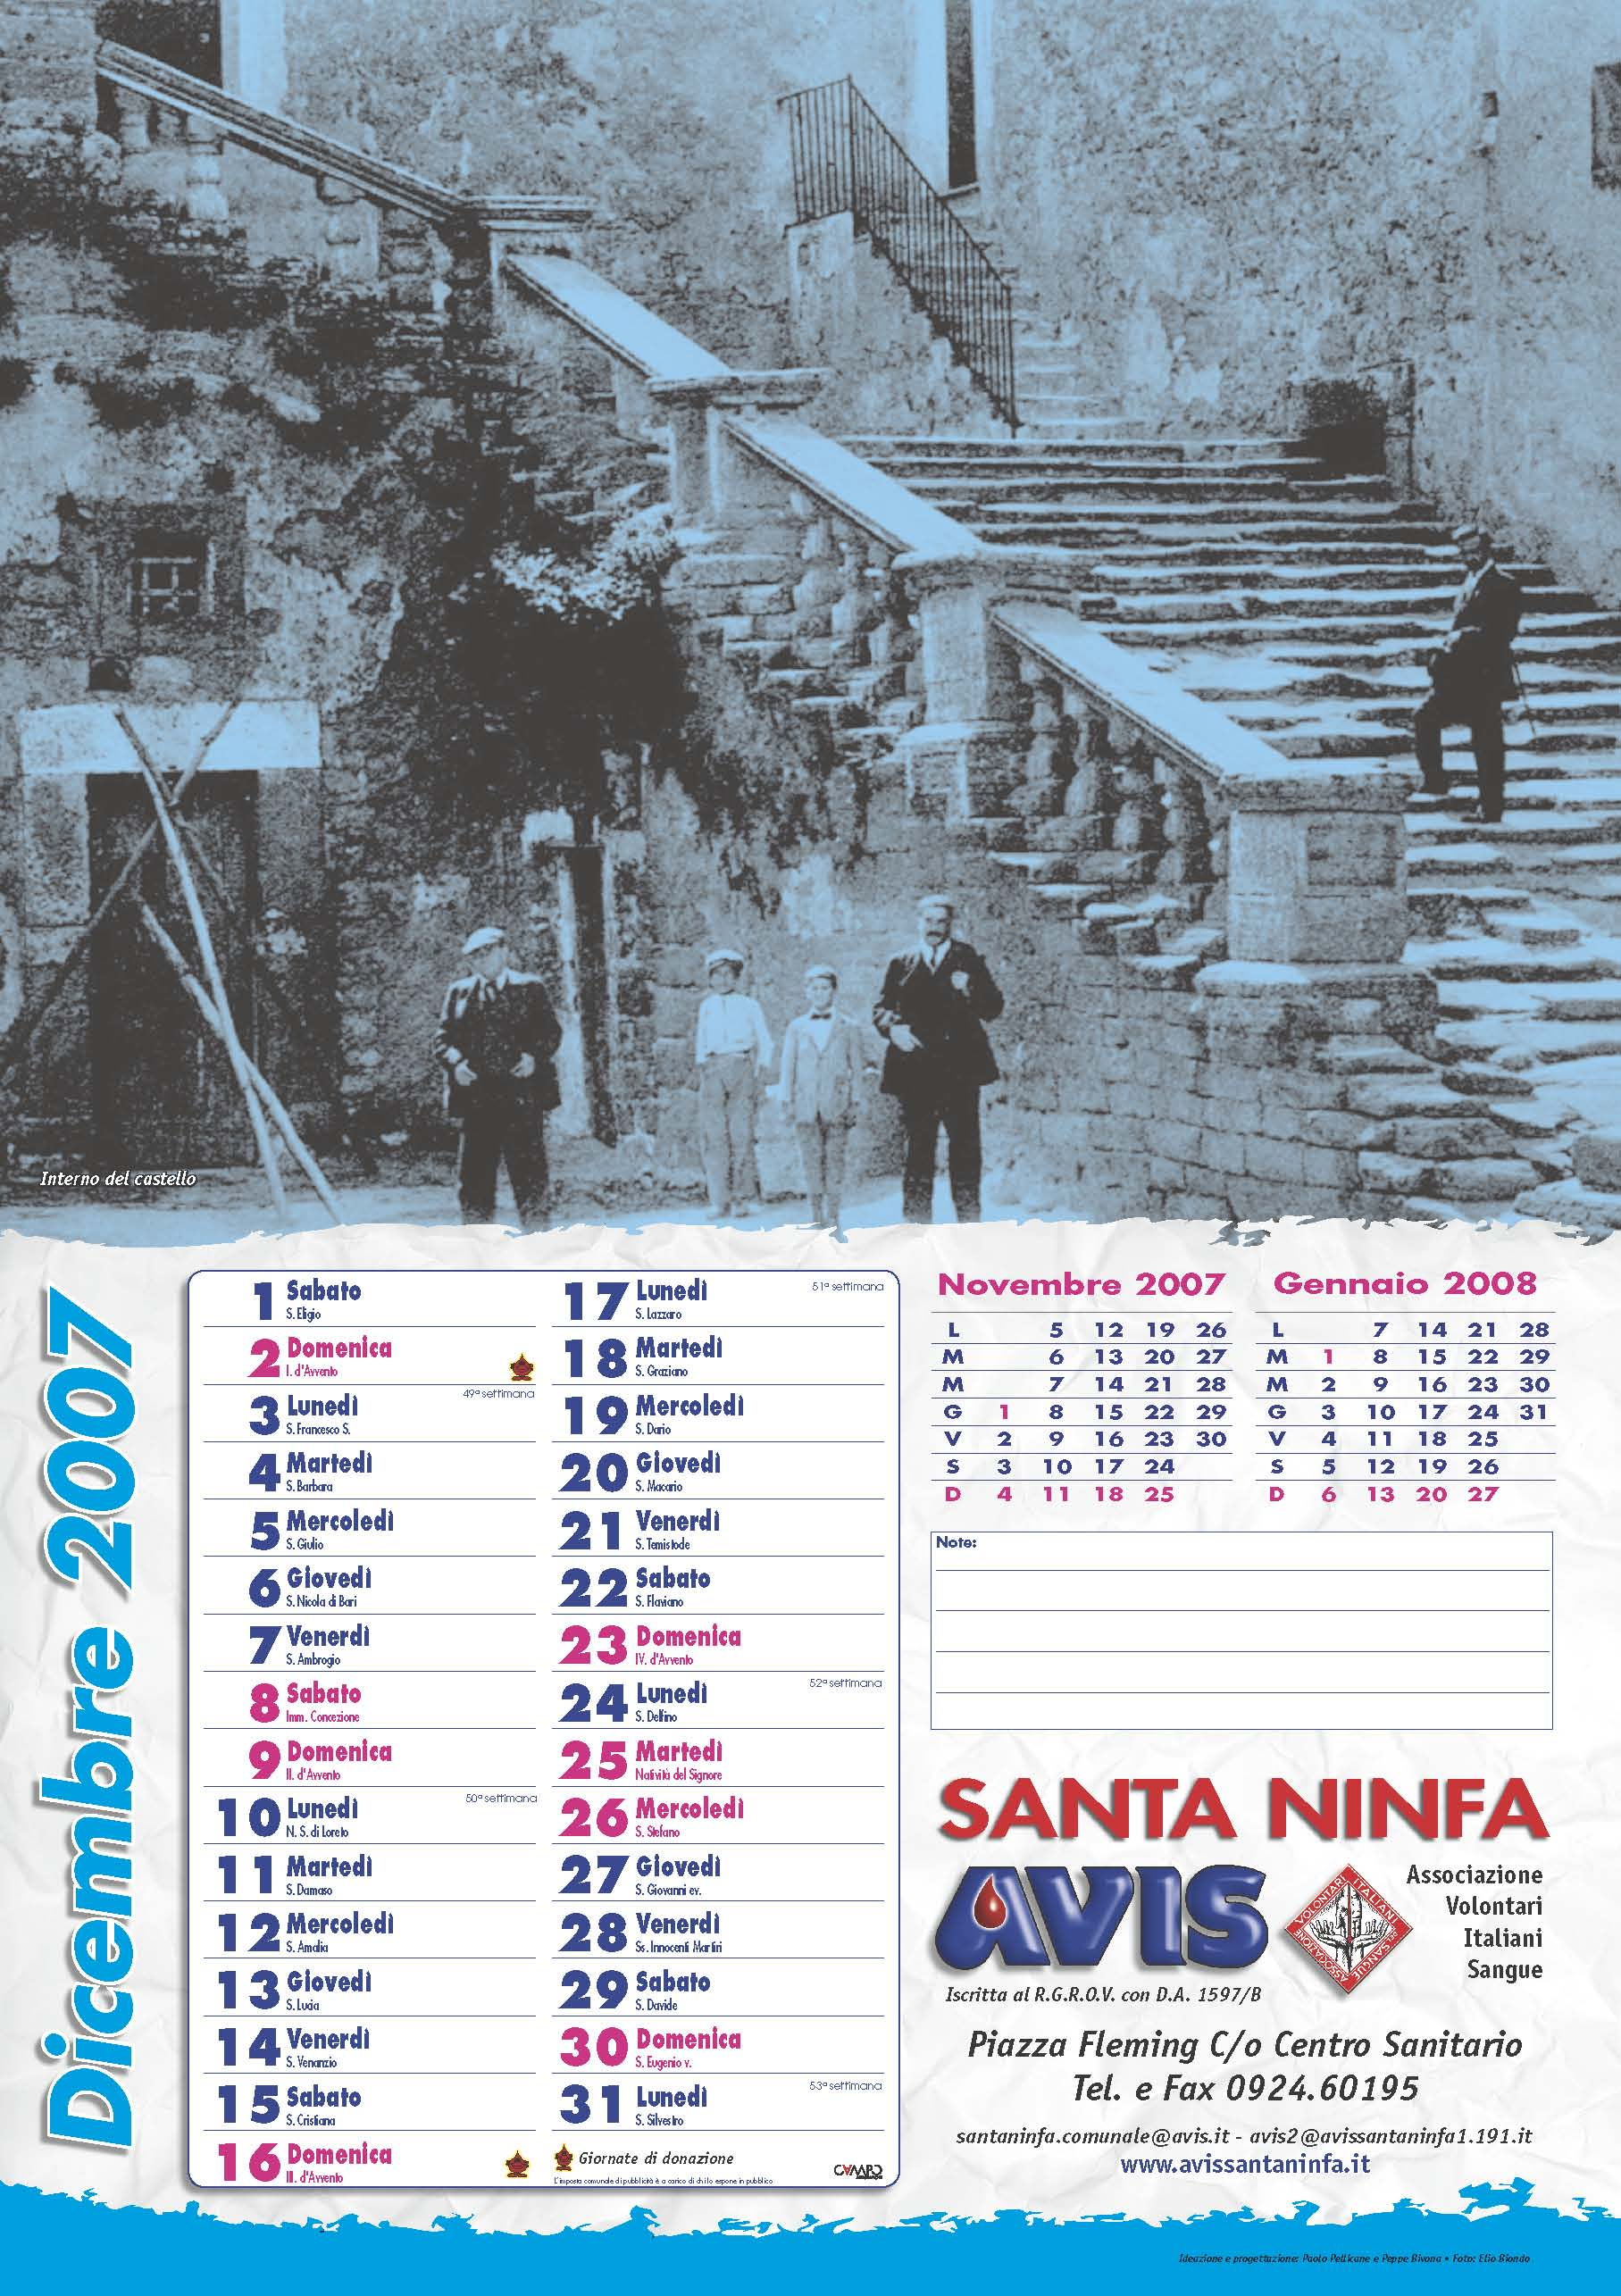 Calendario Avis.Calendario Avis 2007 Avis Santa Ninfa